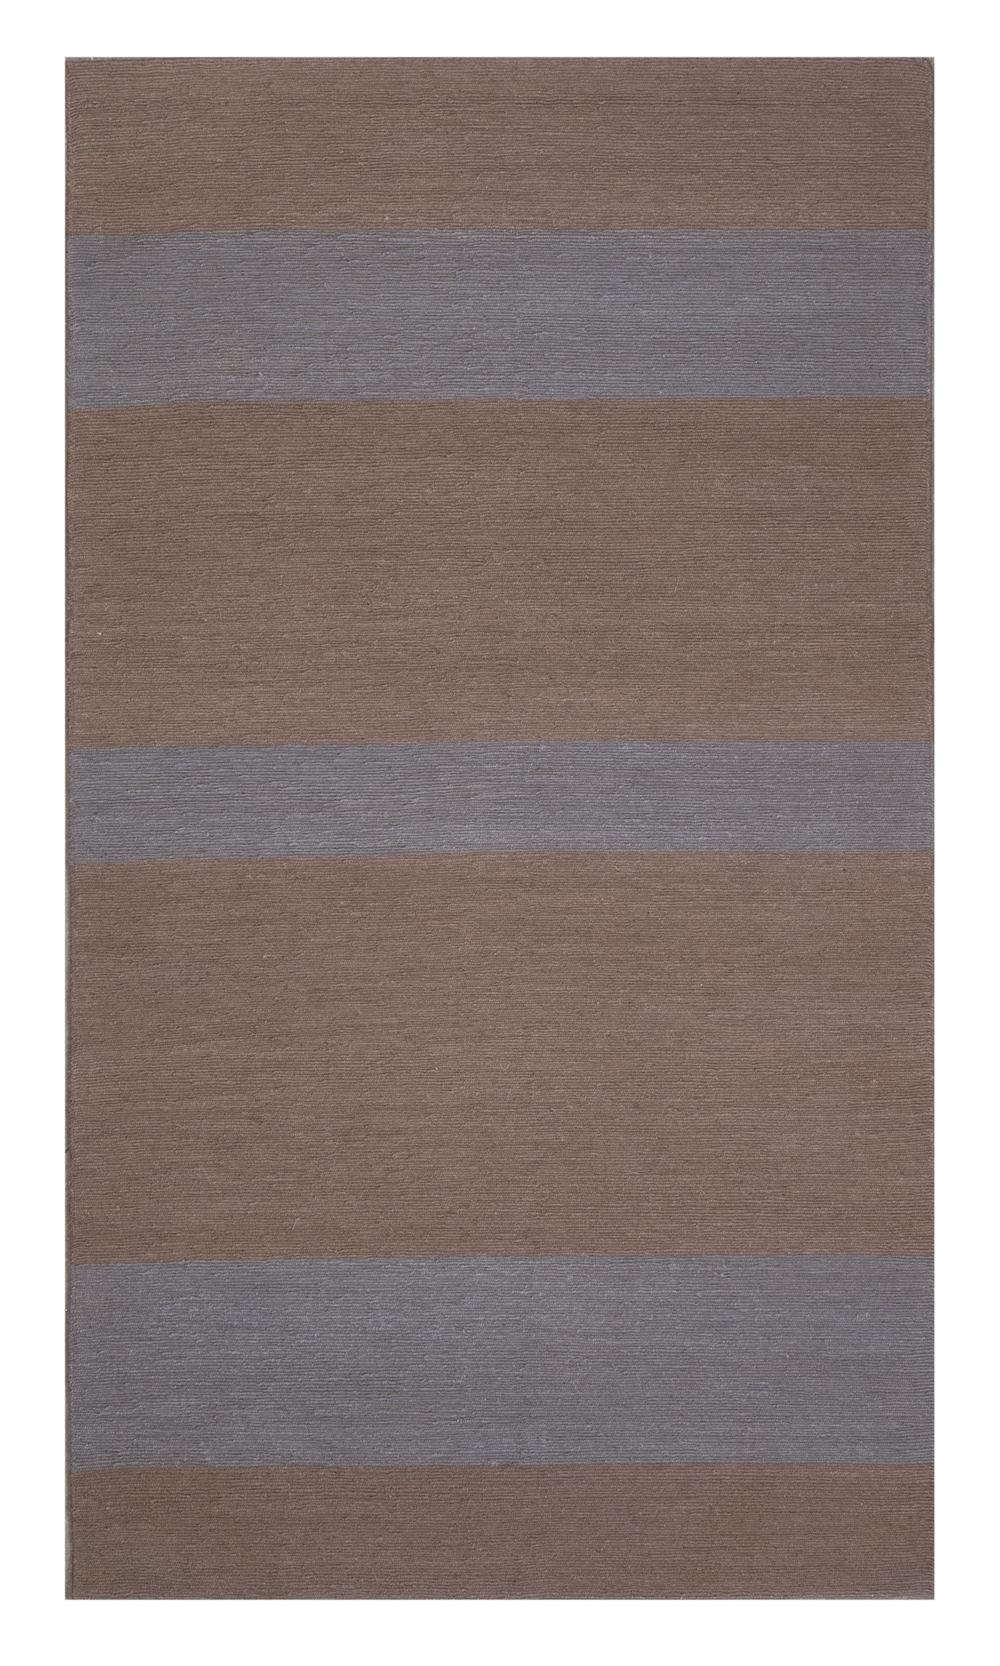 Carini Lang's Sumak carpet